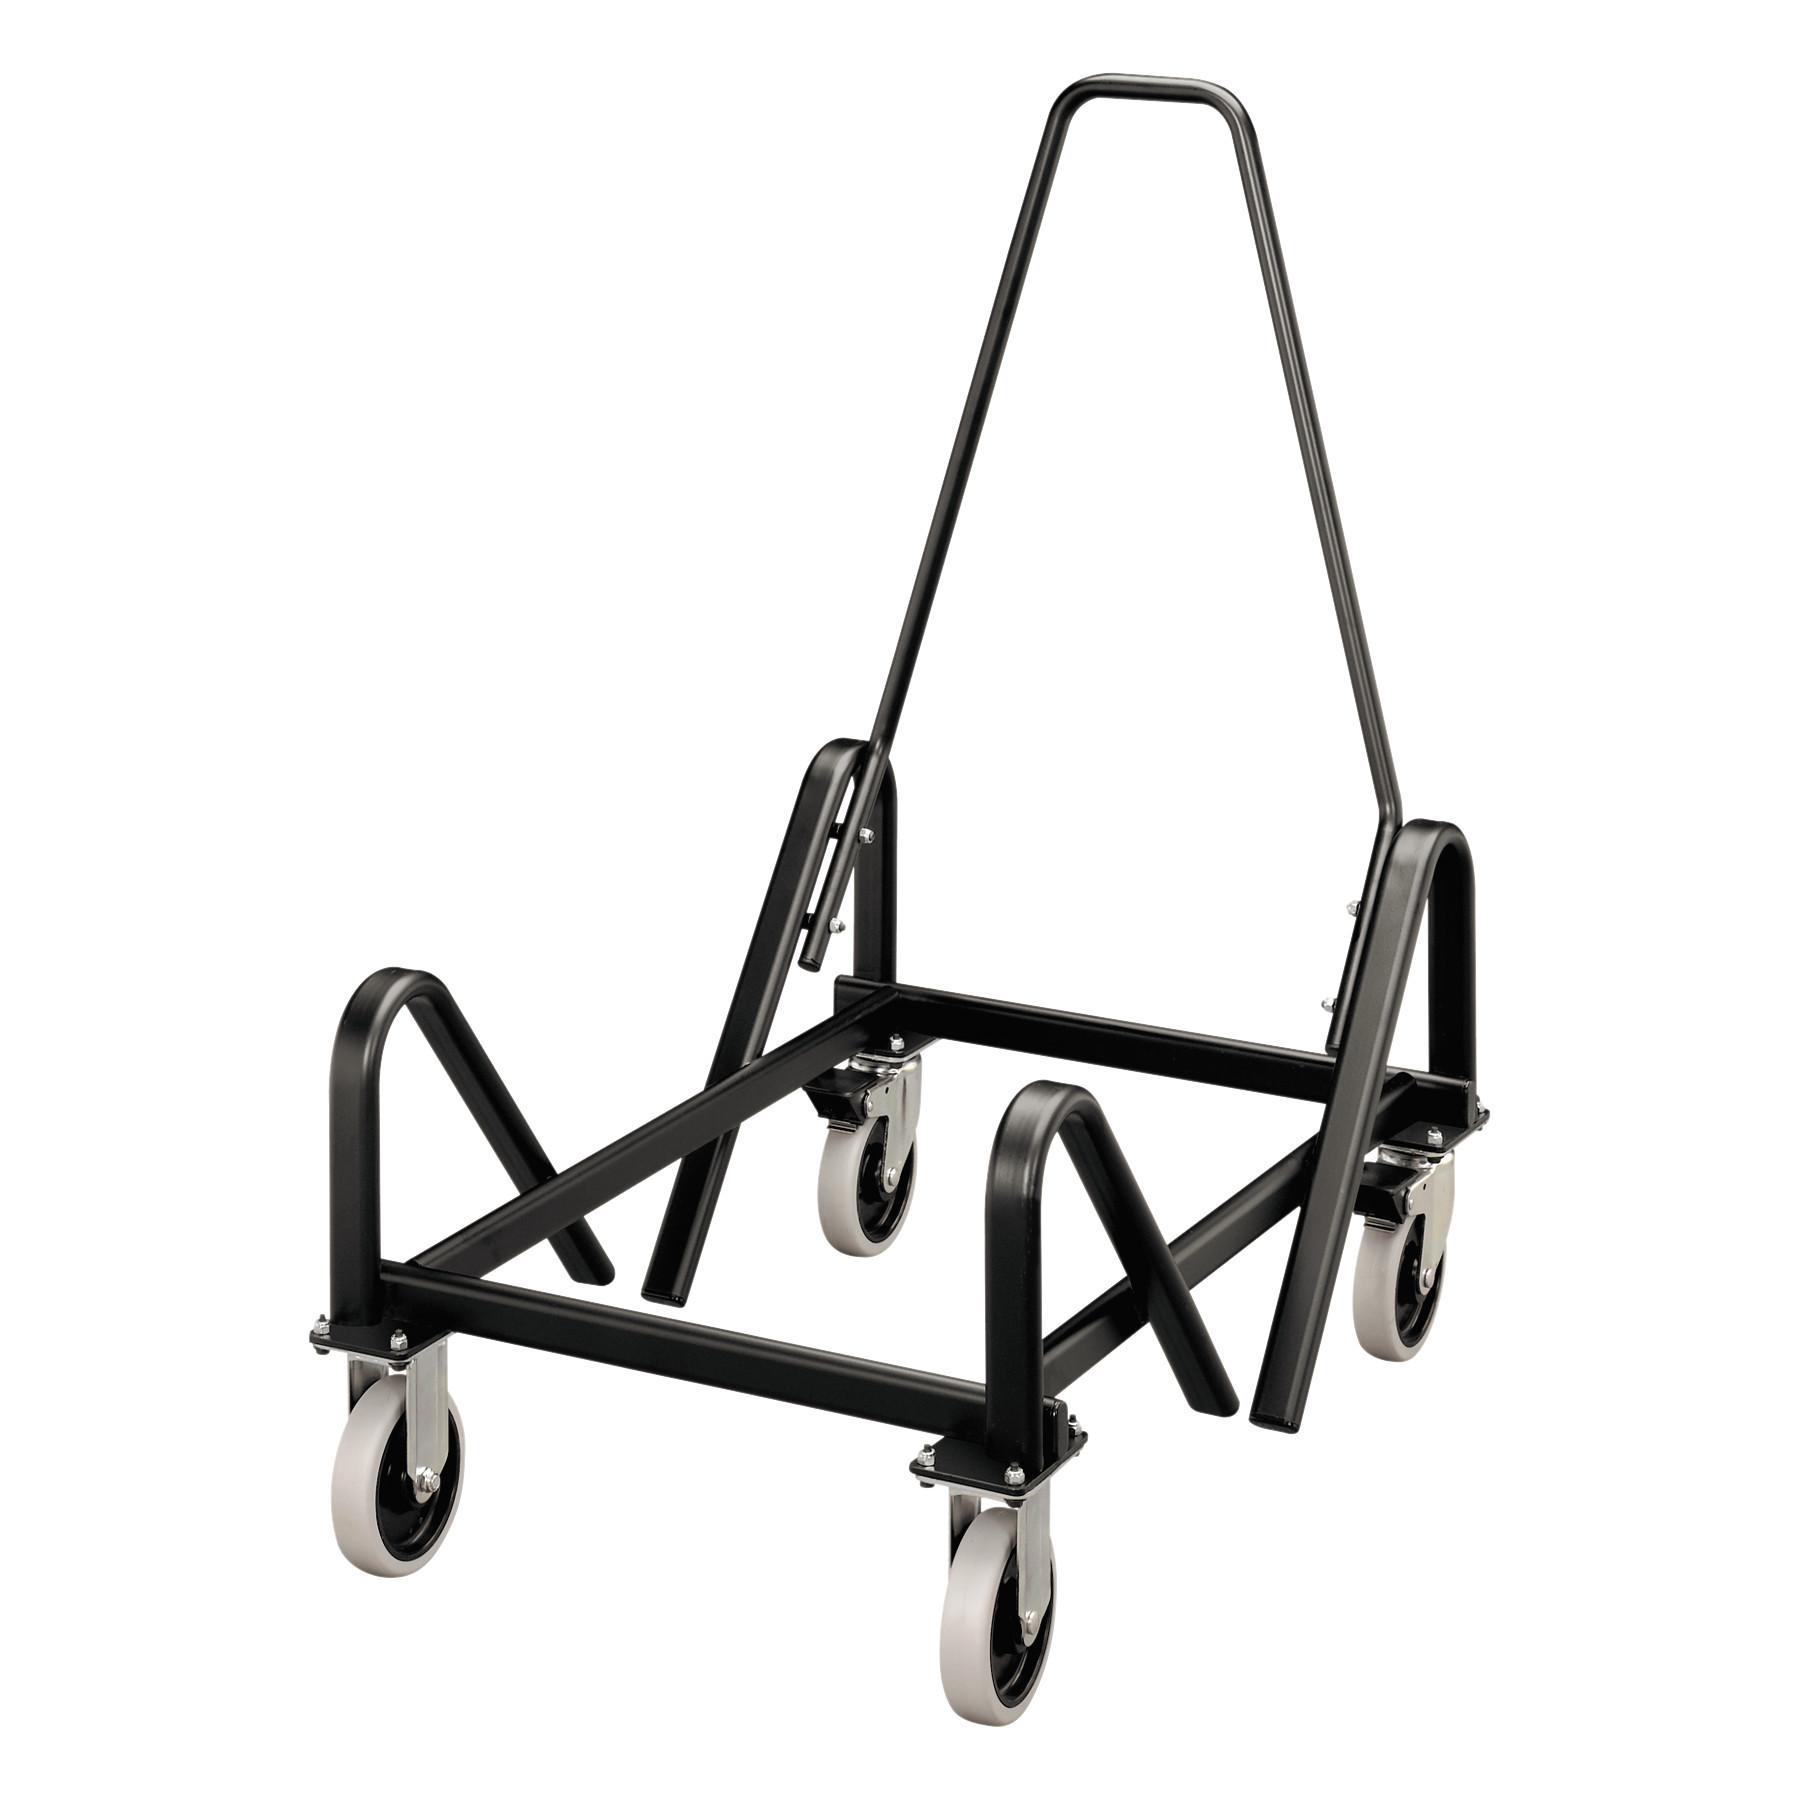 HON Olson Stacker Series Cart, 21-3/8 x 35-1/2 x 37, Black